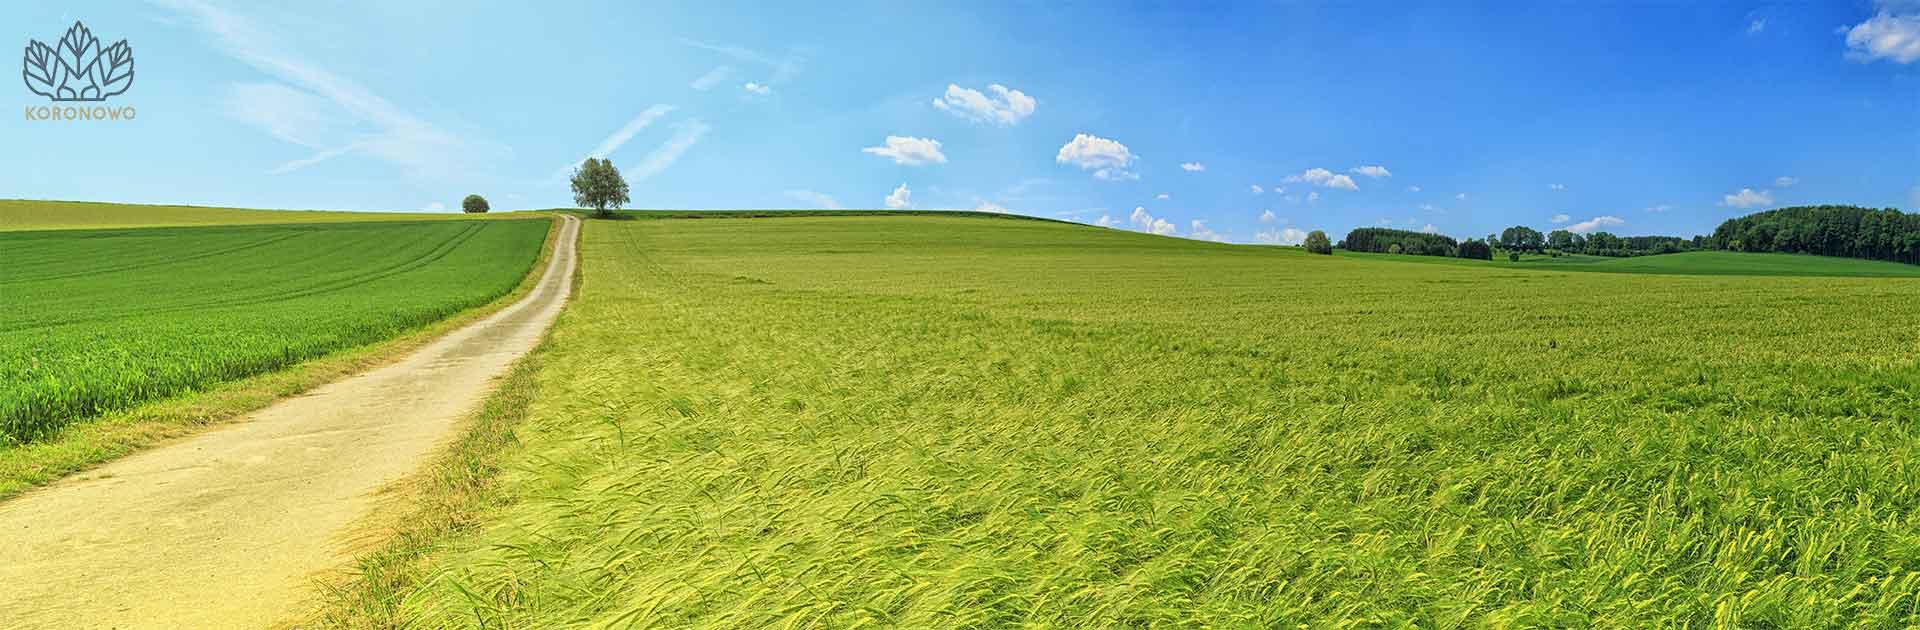 Widok na pole zbóż na Kujawach